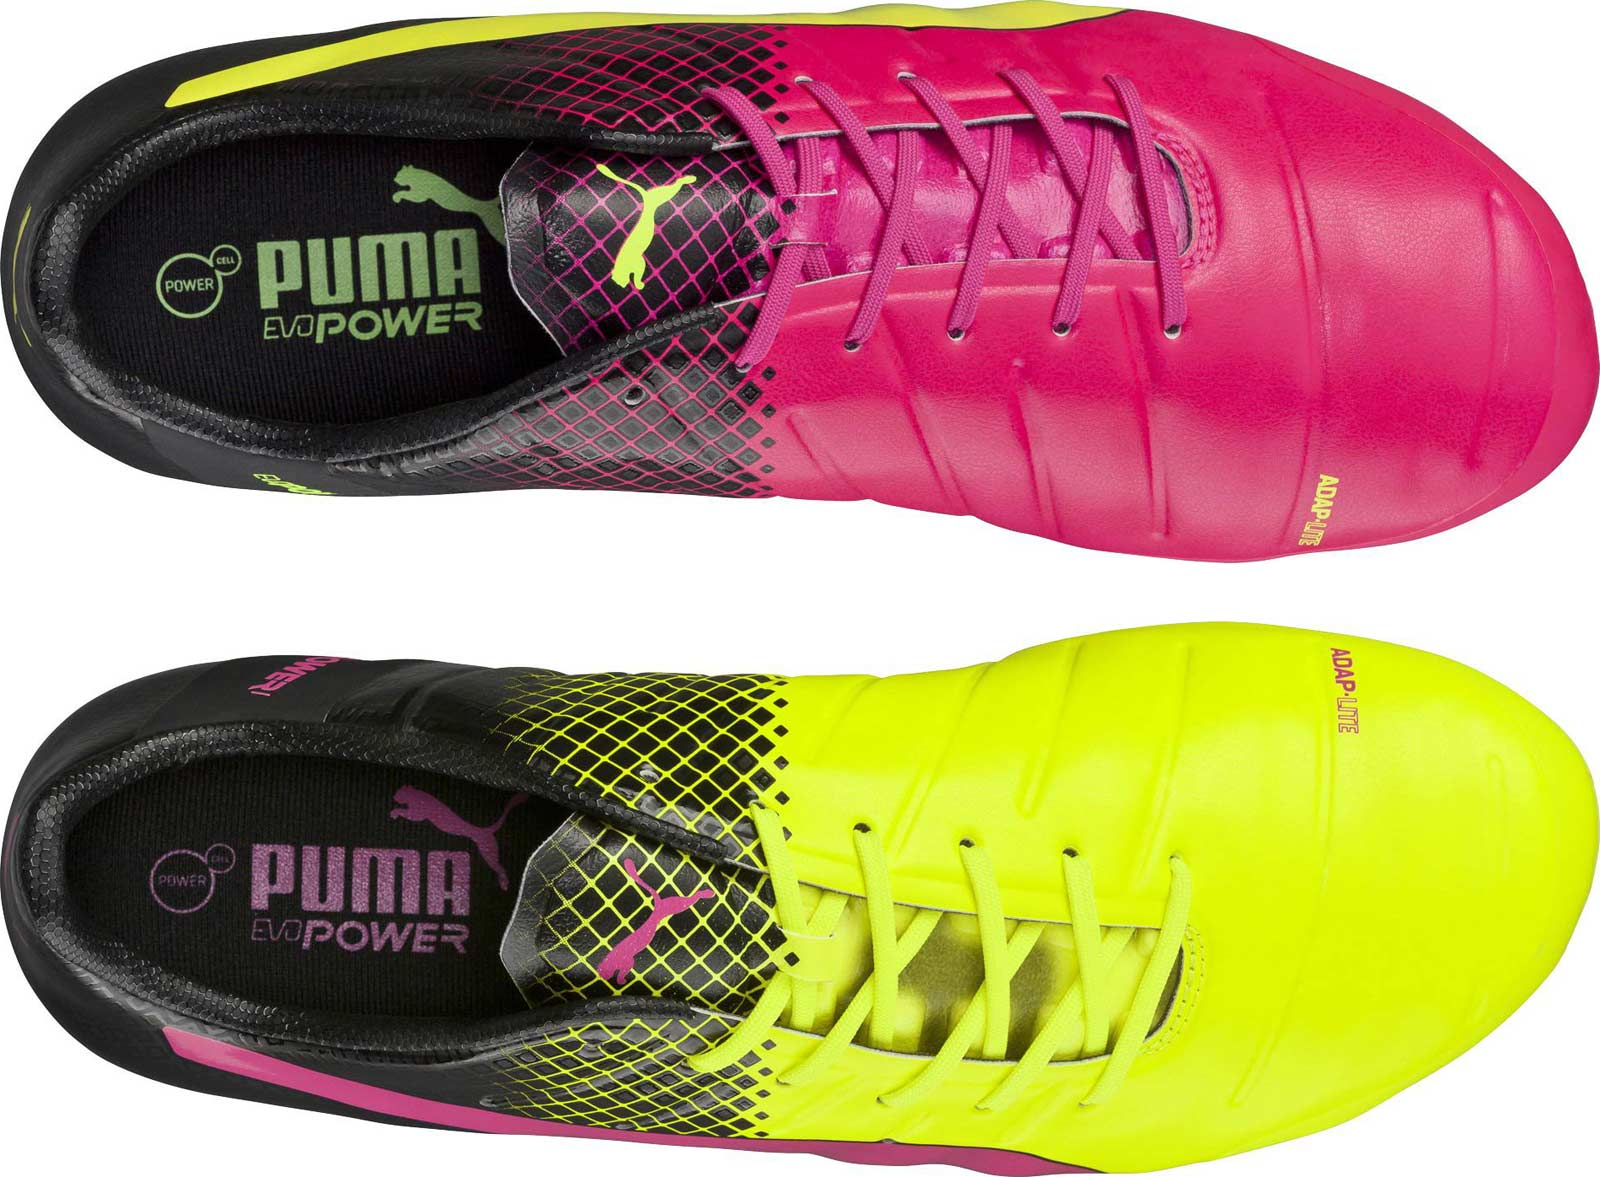 Puma Evopower Tricks